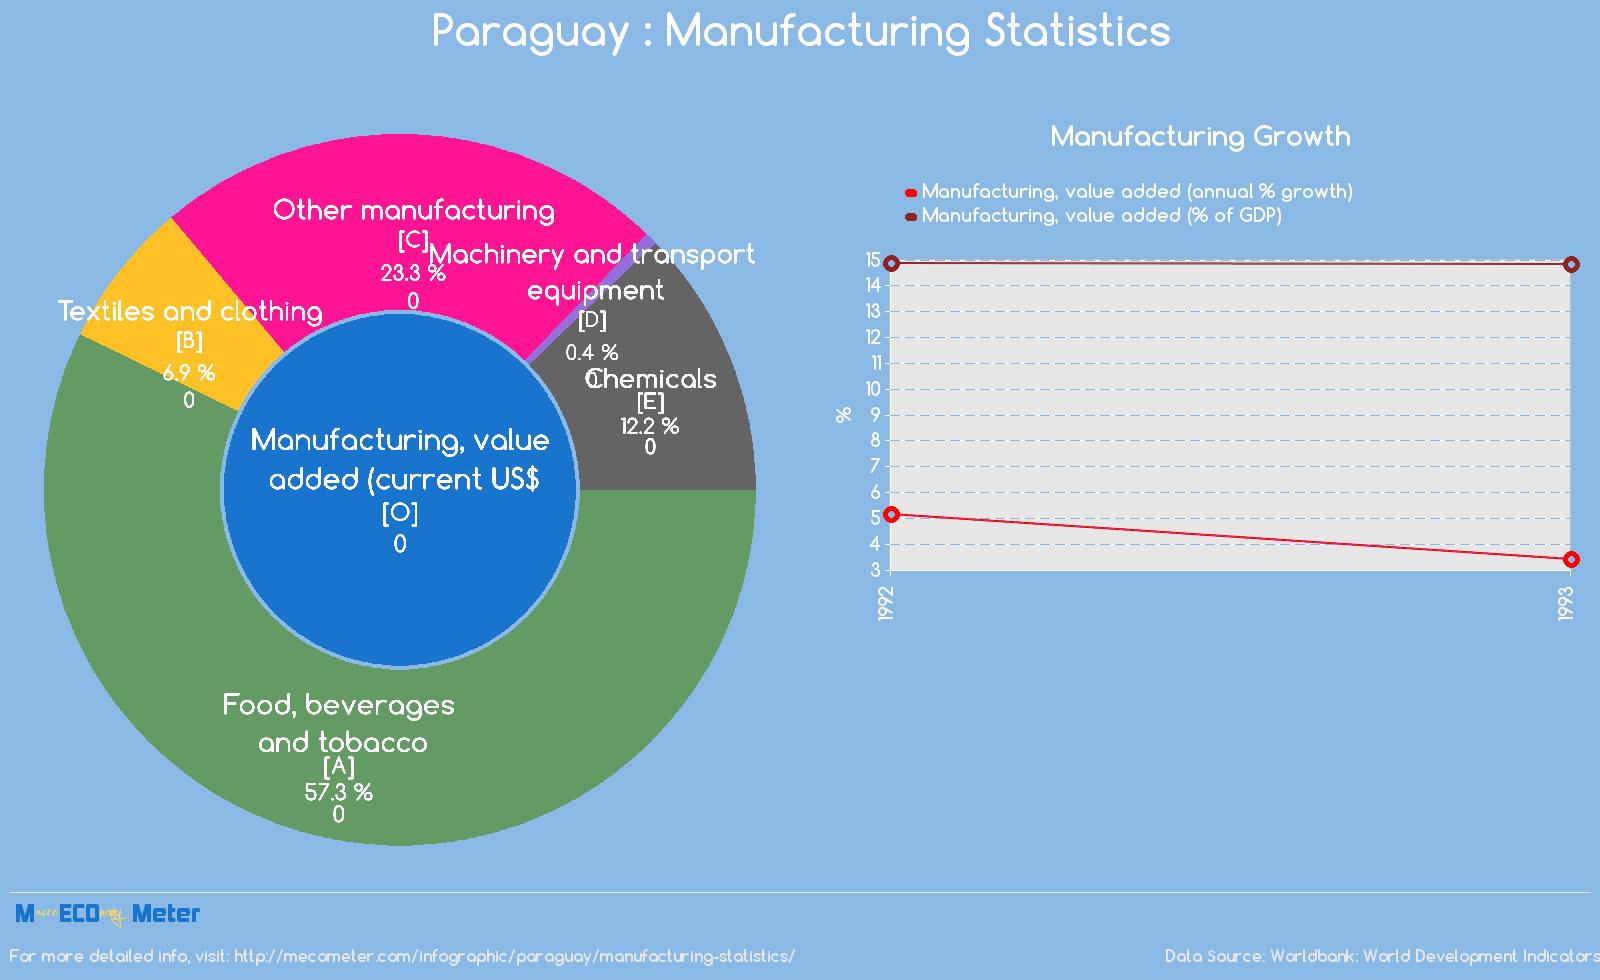 Paraguay : Manufacturing Statistics